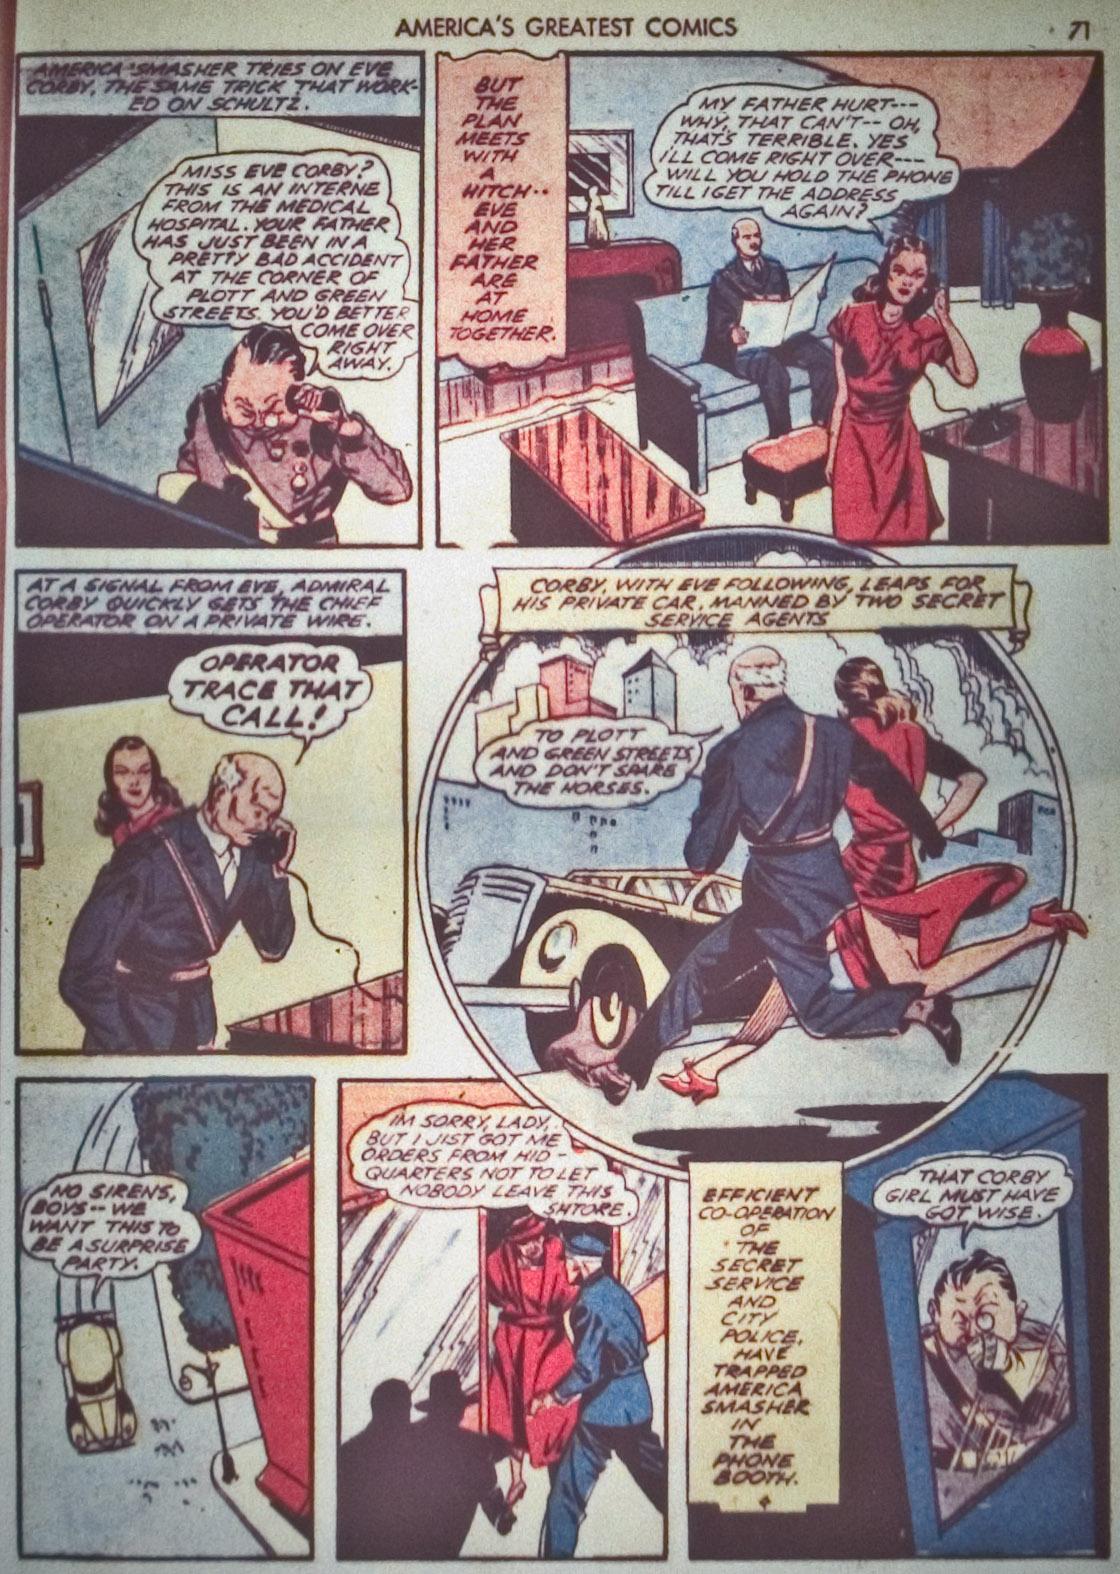 Read online America's Greatest Comics comic -  Issue #1 - 74